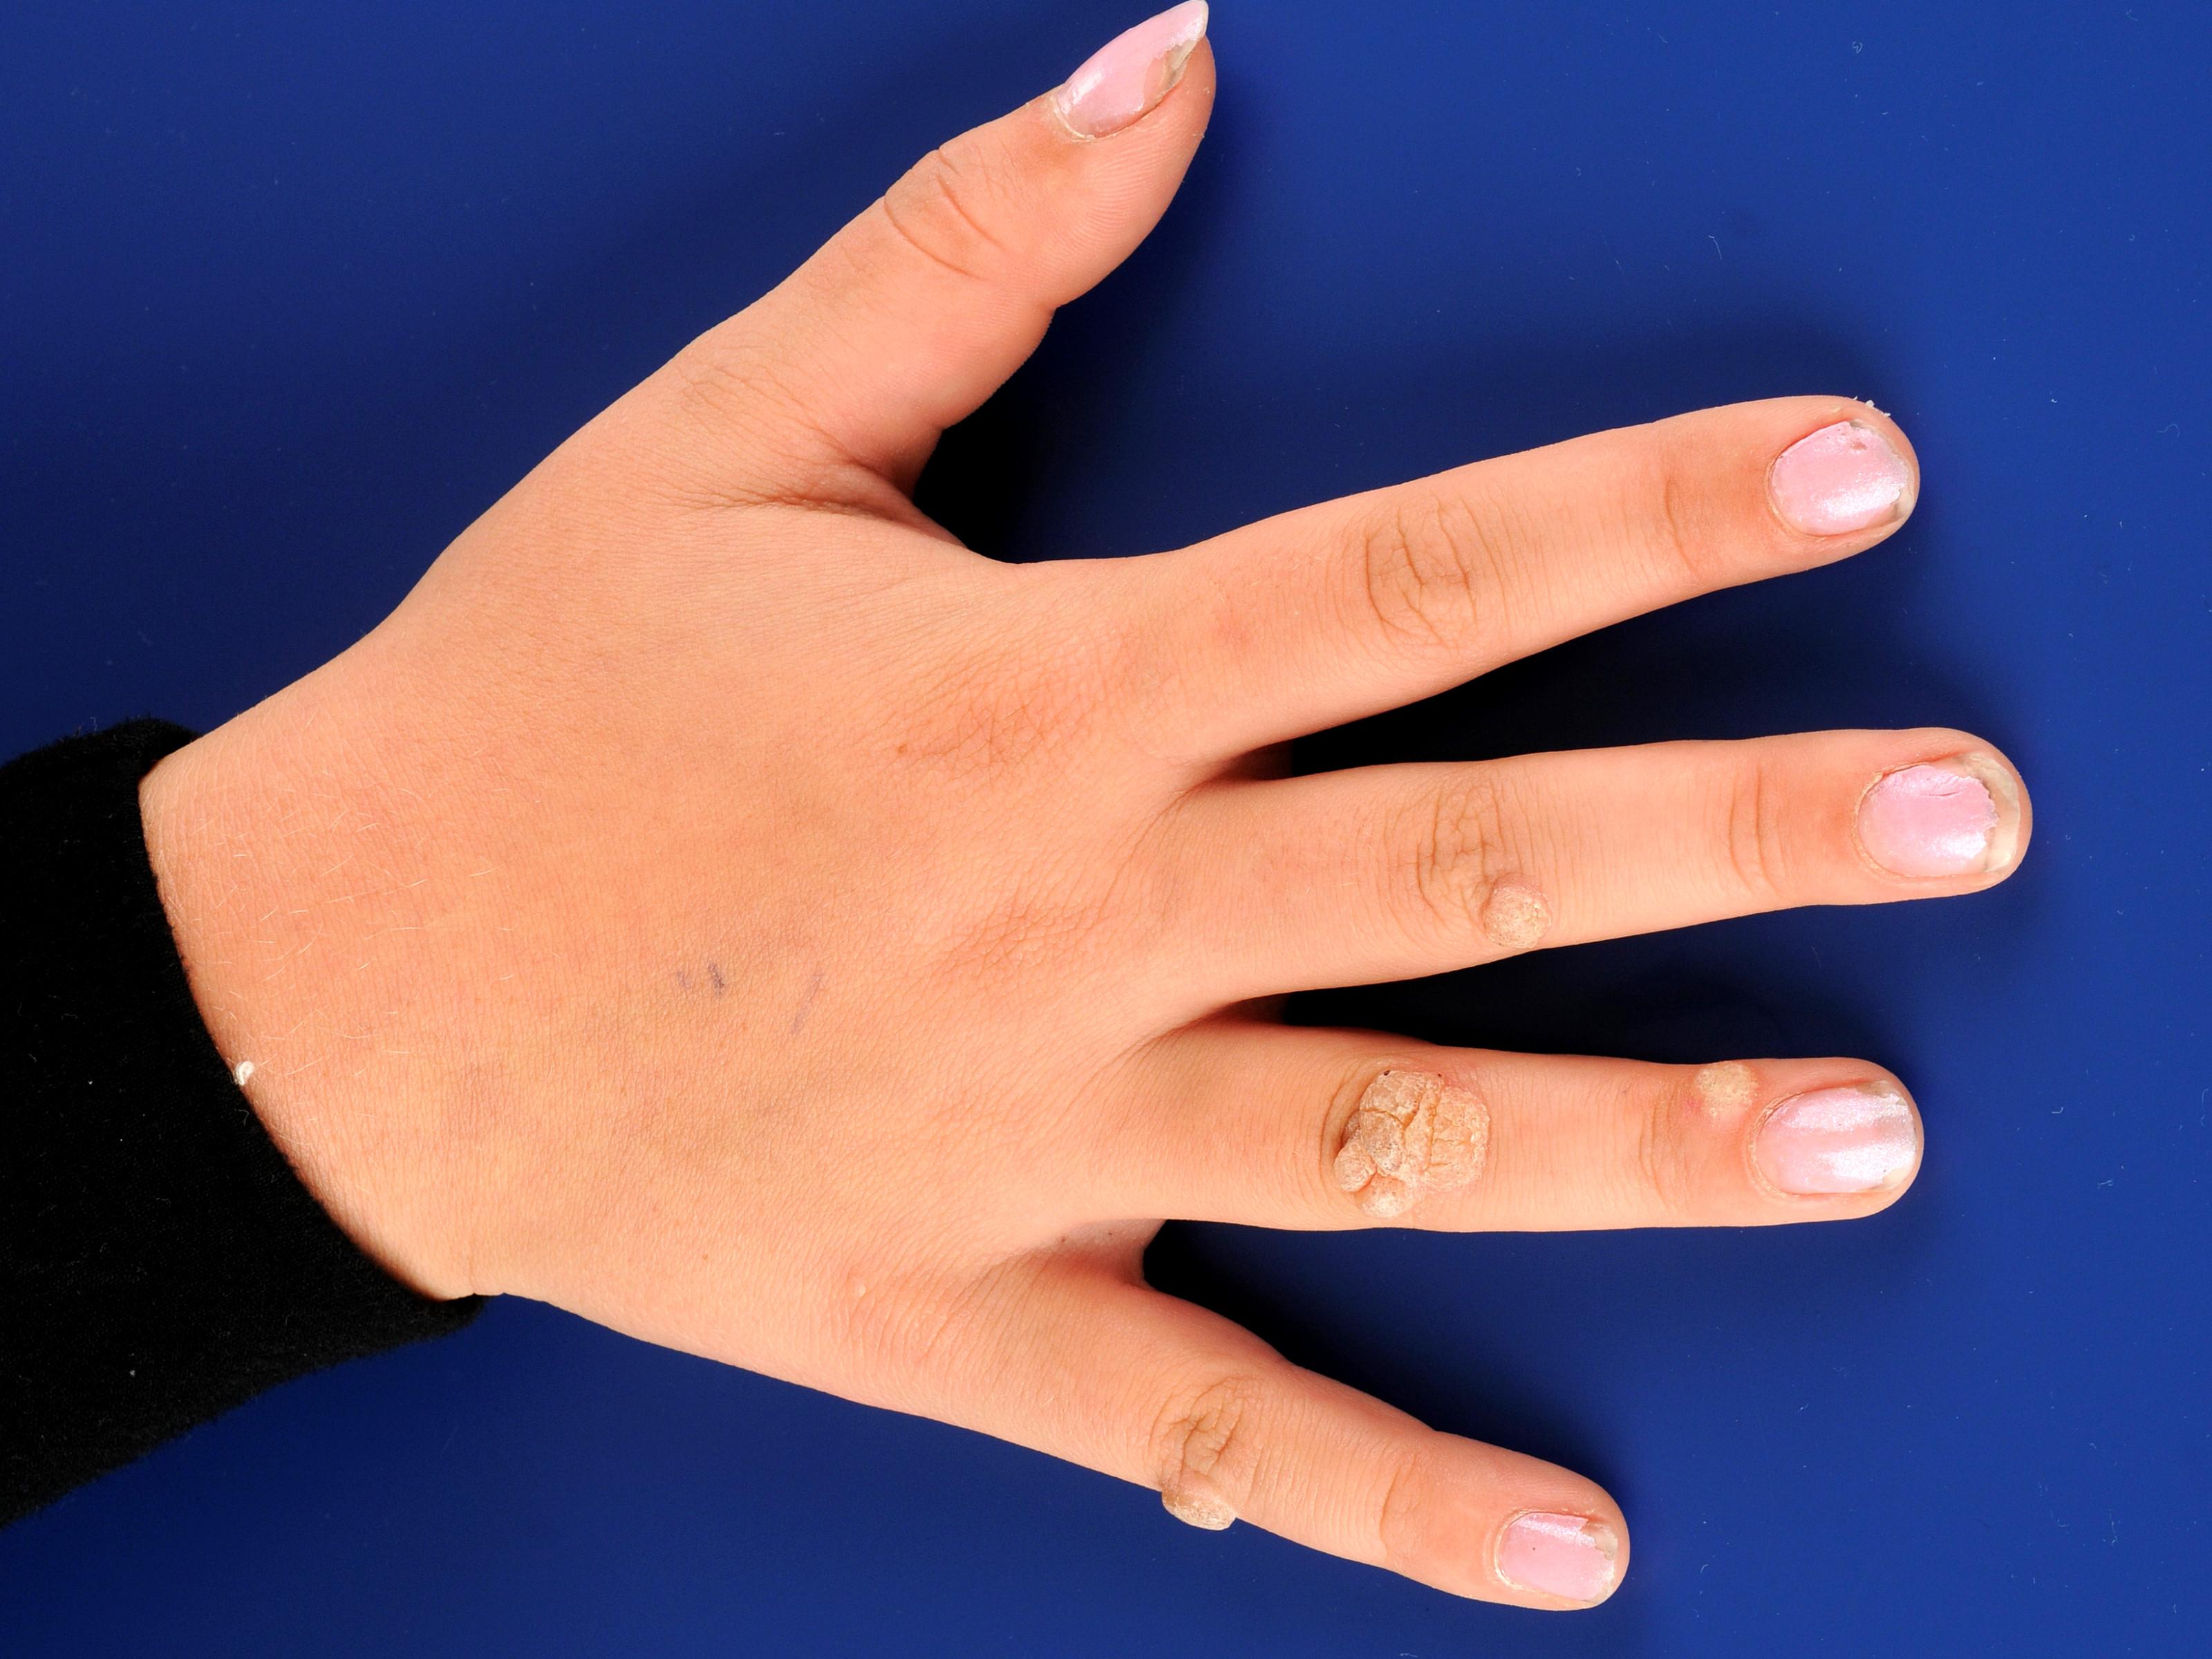 HPV și hiperplazie endometrială icd-9 - Squamous cell papilloma and verruca vulgaris